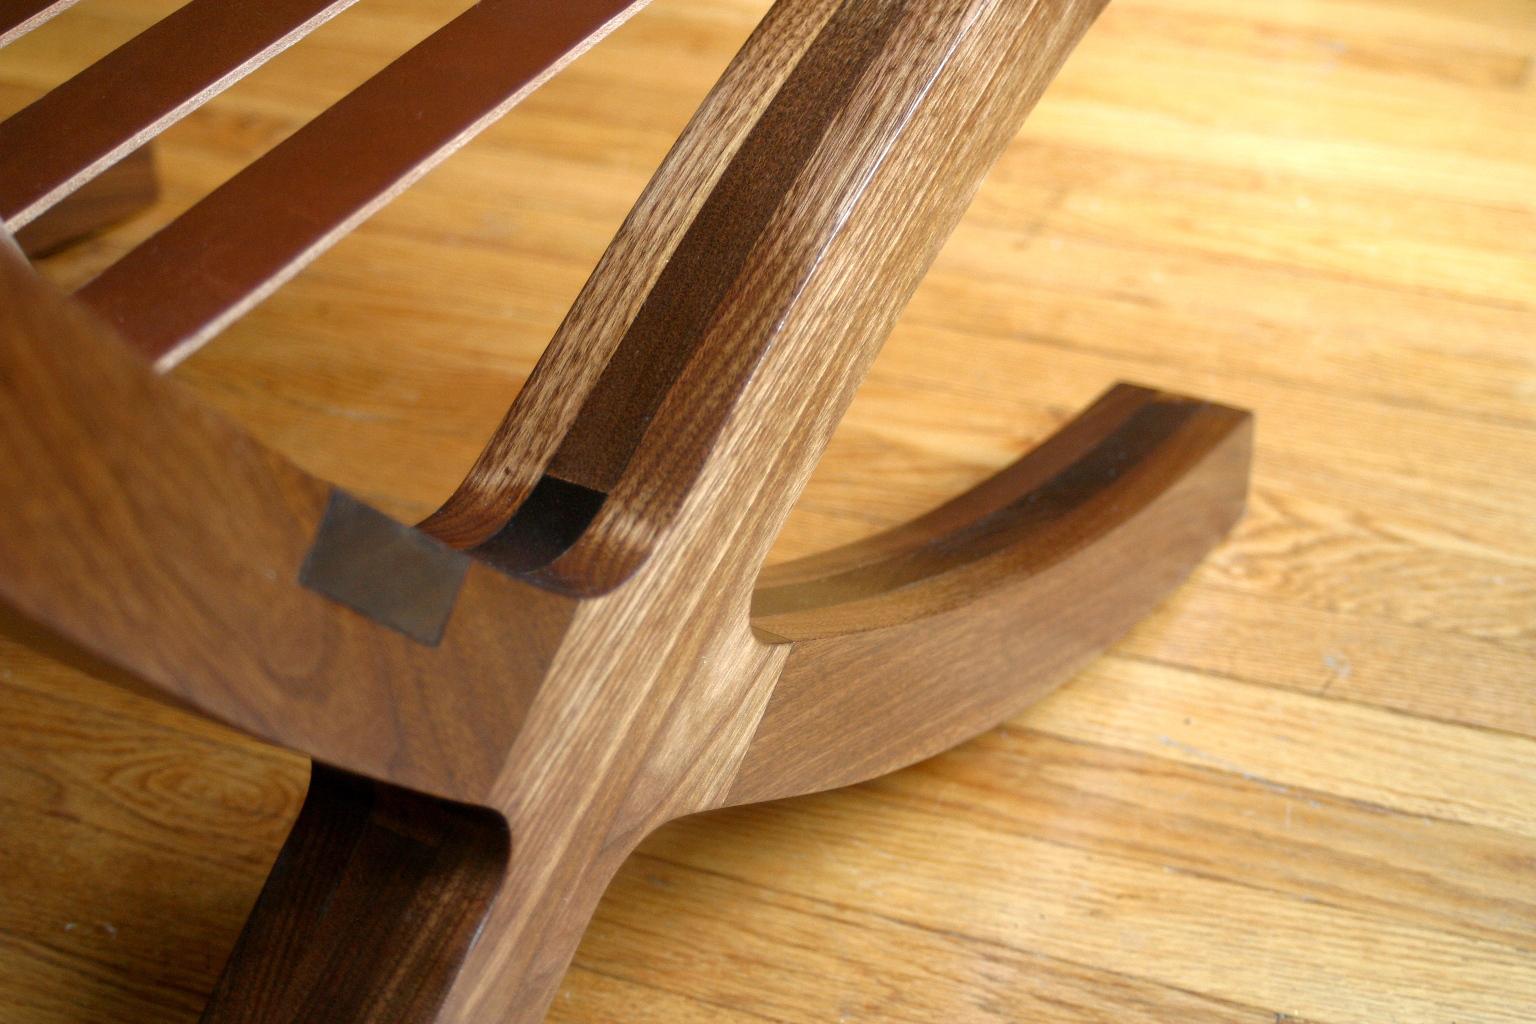 016 - Tess Stelzer Barcelona Chair (8).JPG